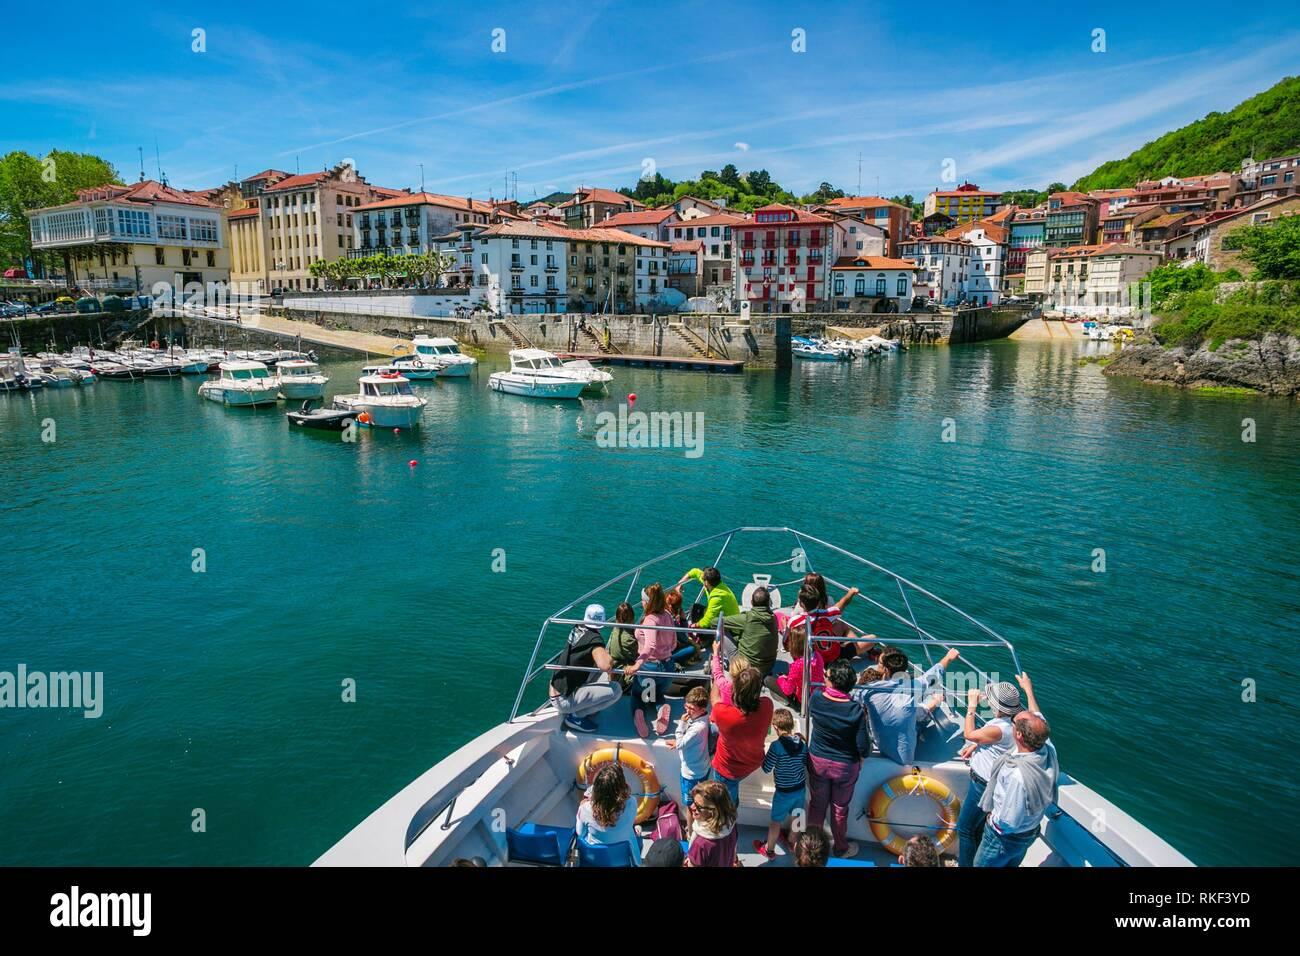 Hegaluze Cruise from Bermeo to Elantxobe passing through the Island of Izaro. In the background, Mundaka. Urdaibai Region. Bizkaia. Basque Country. - Stock Image